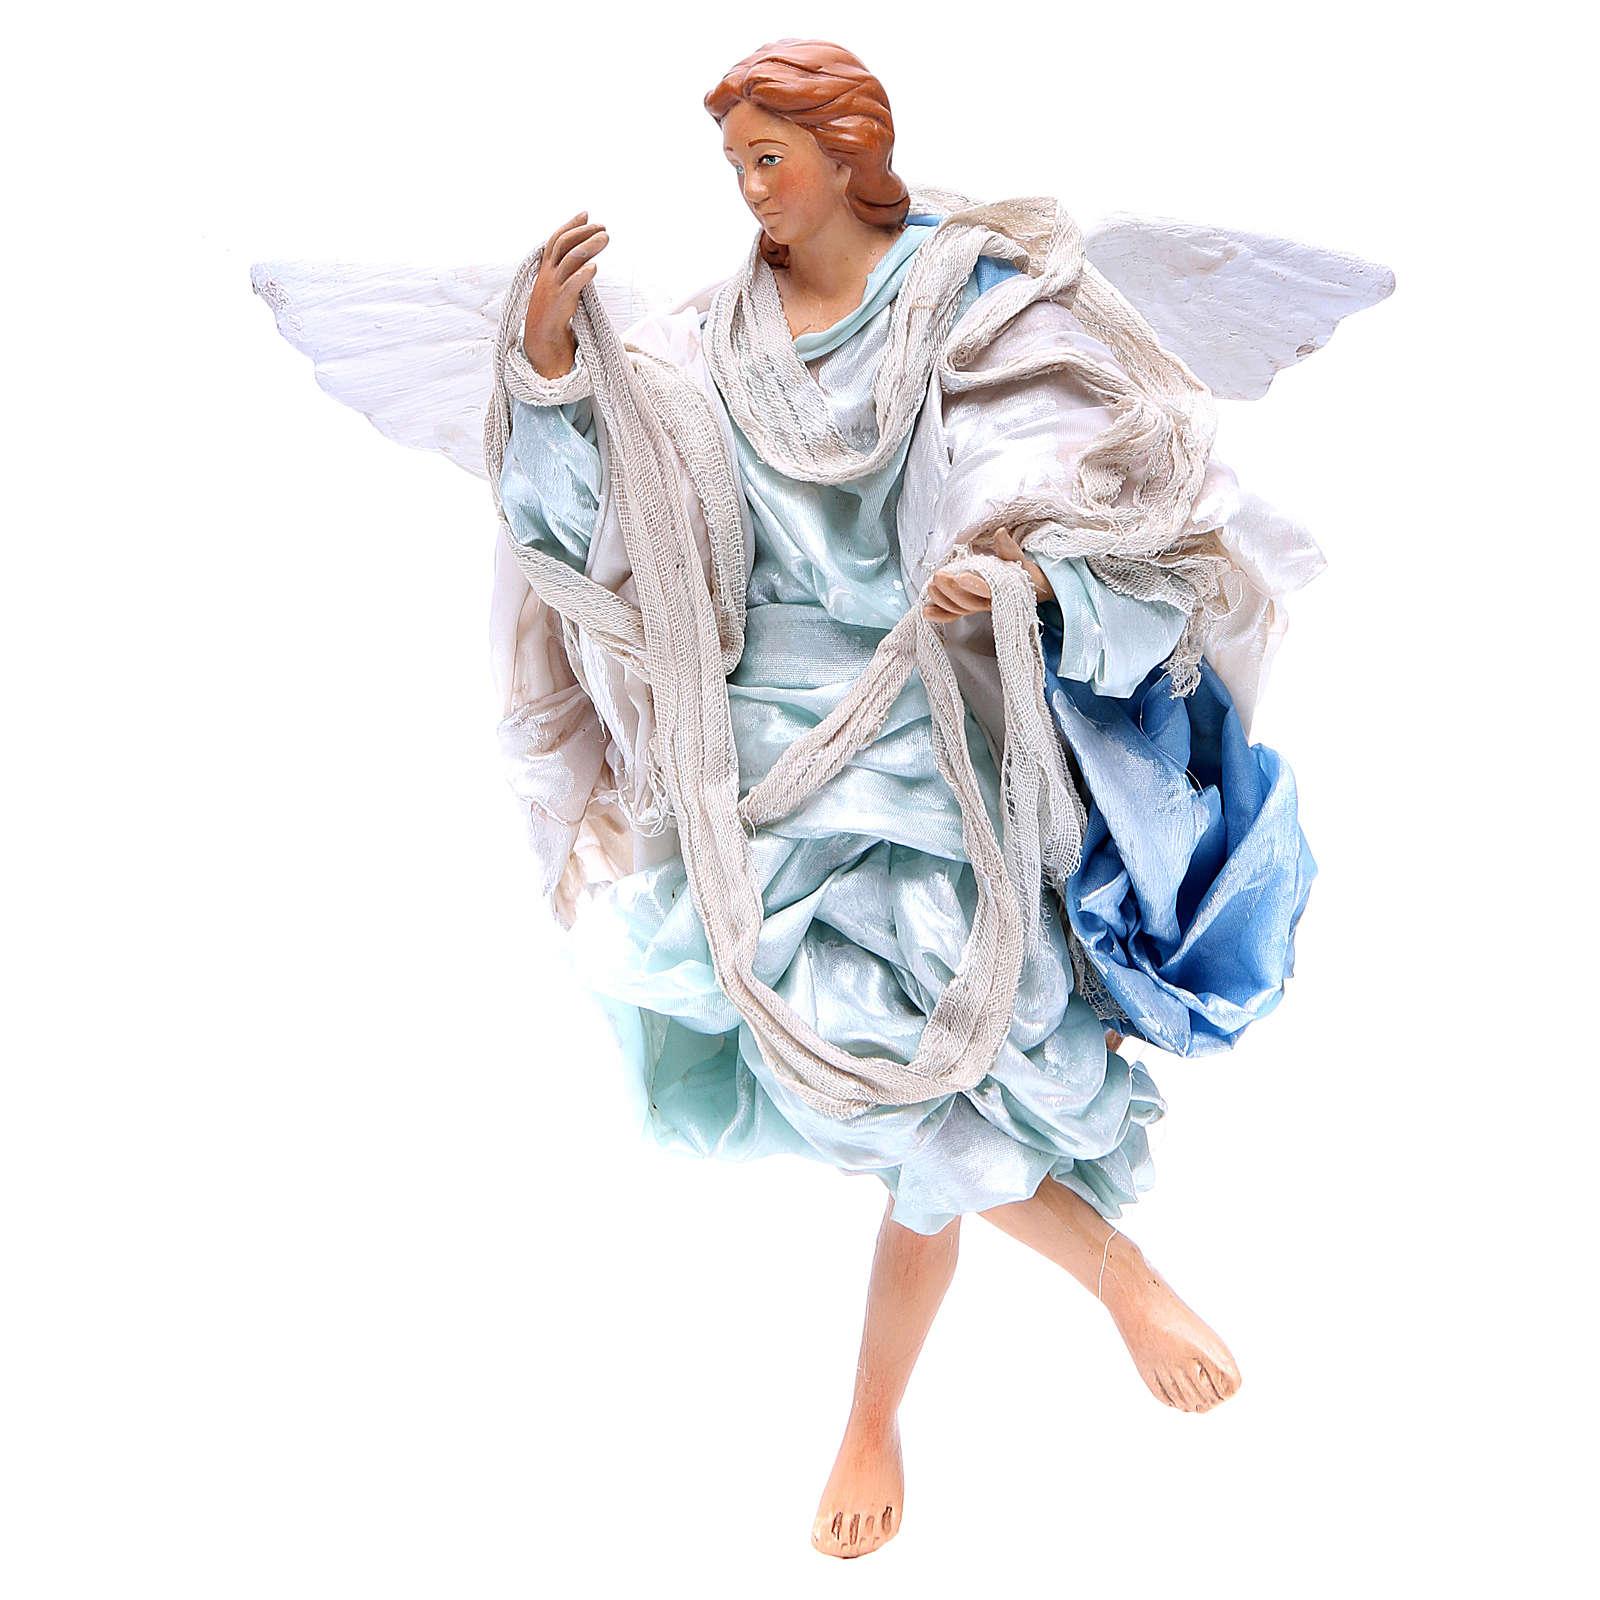 Angelo azzurro 30 cm presepe napoletano 4